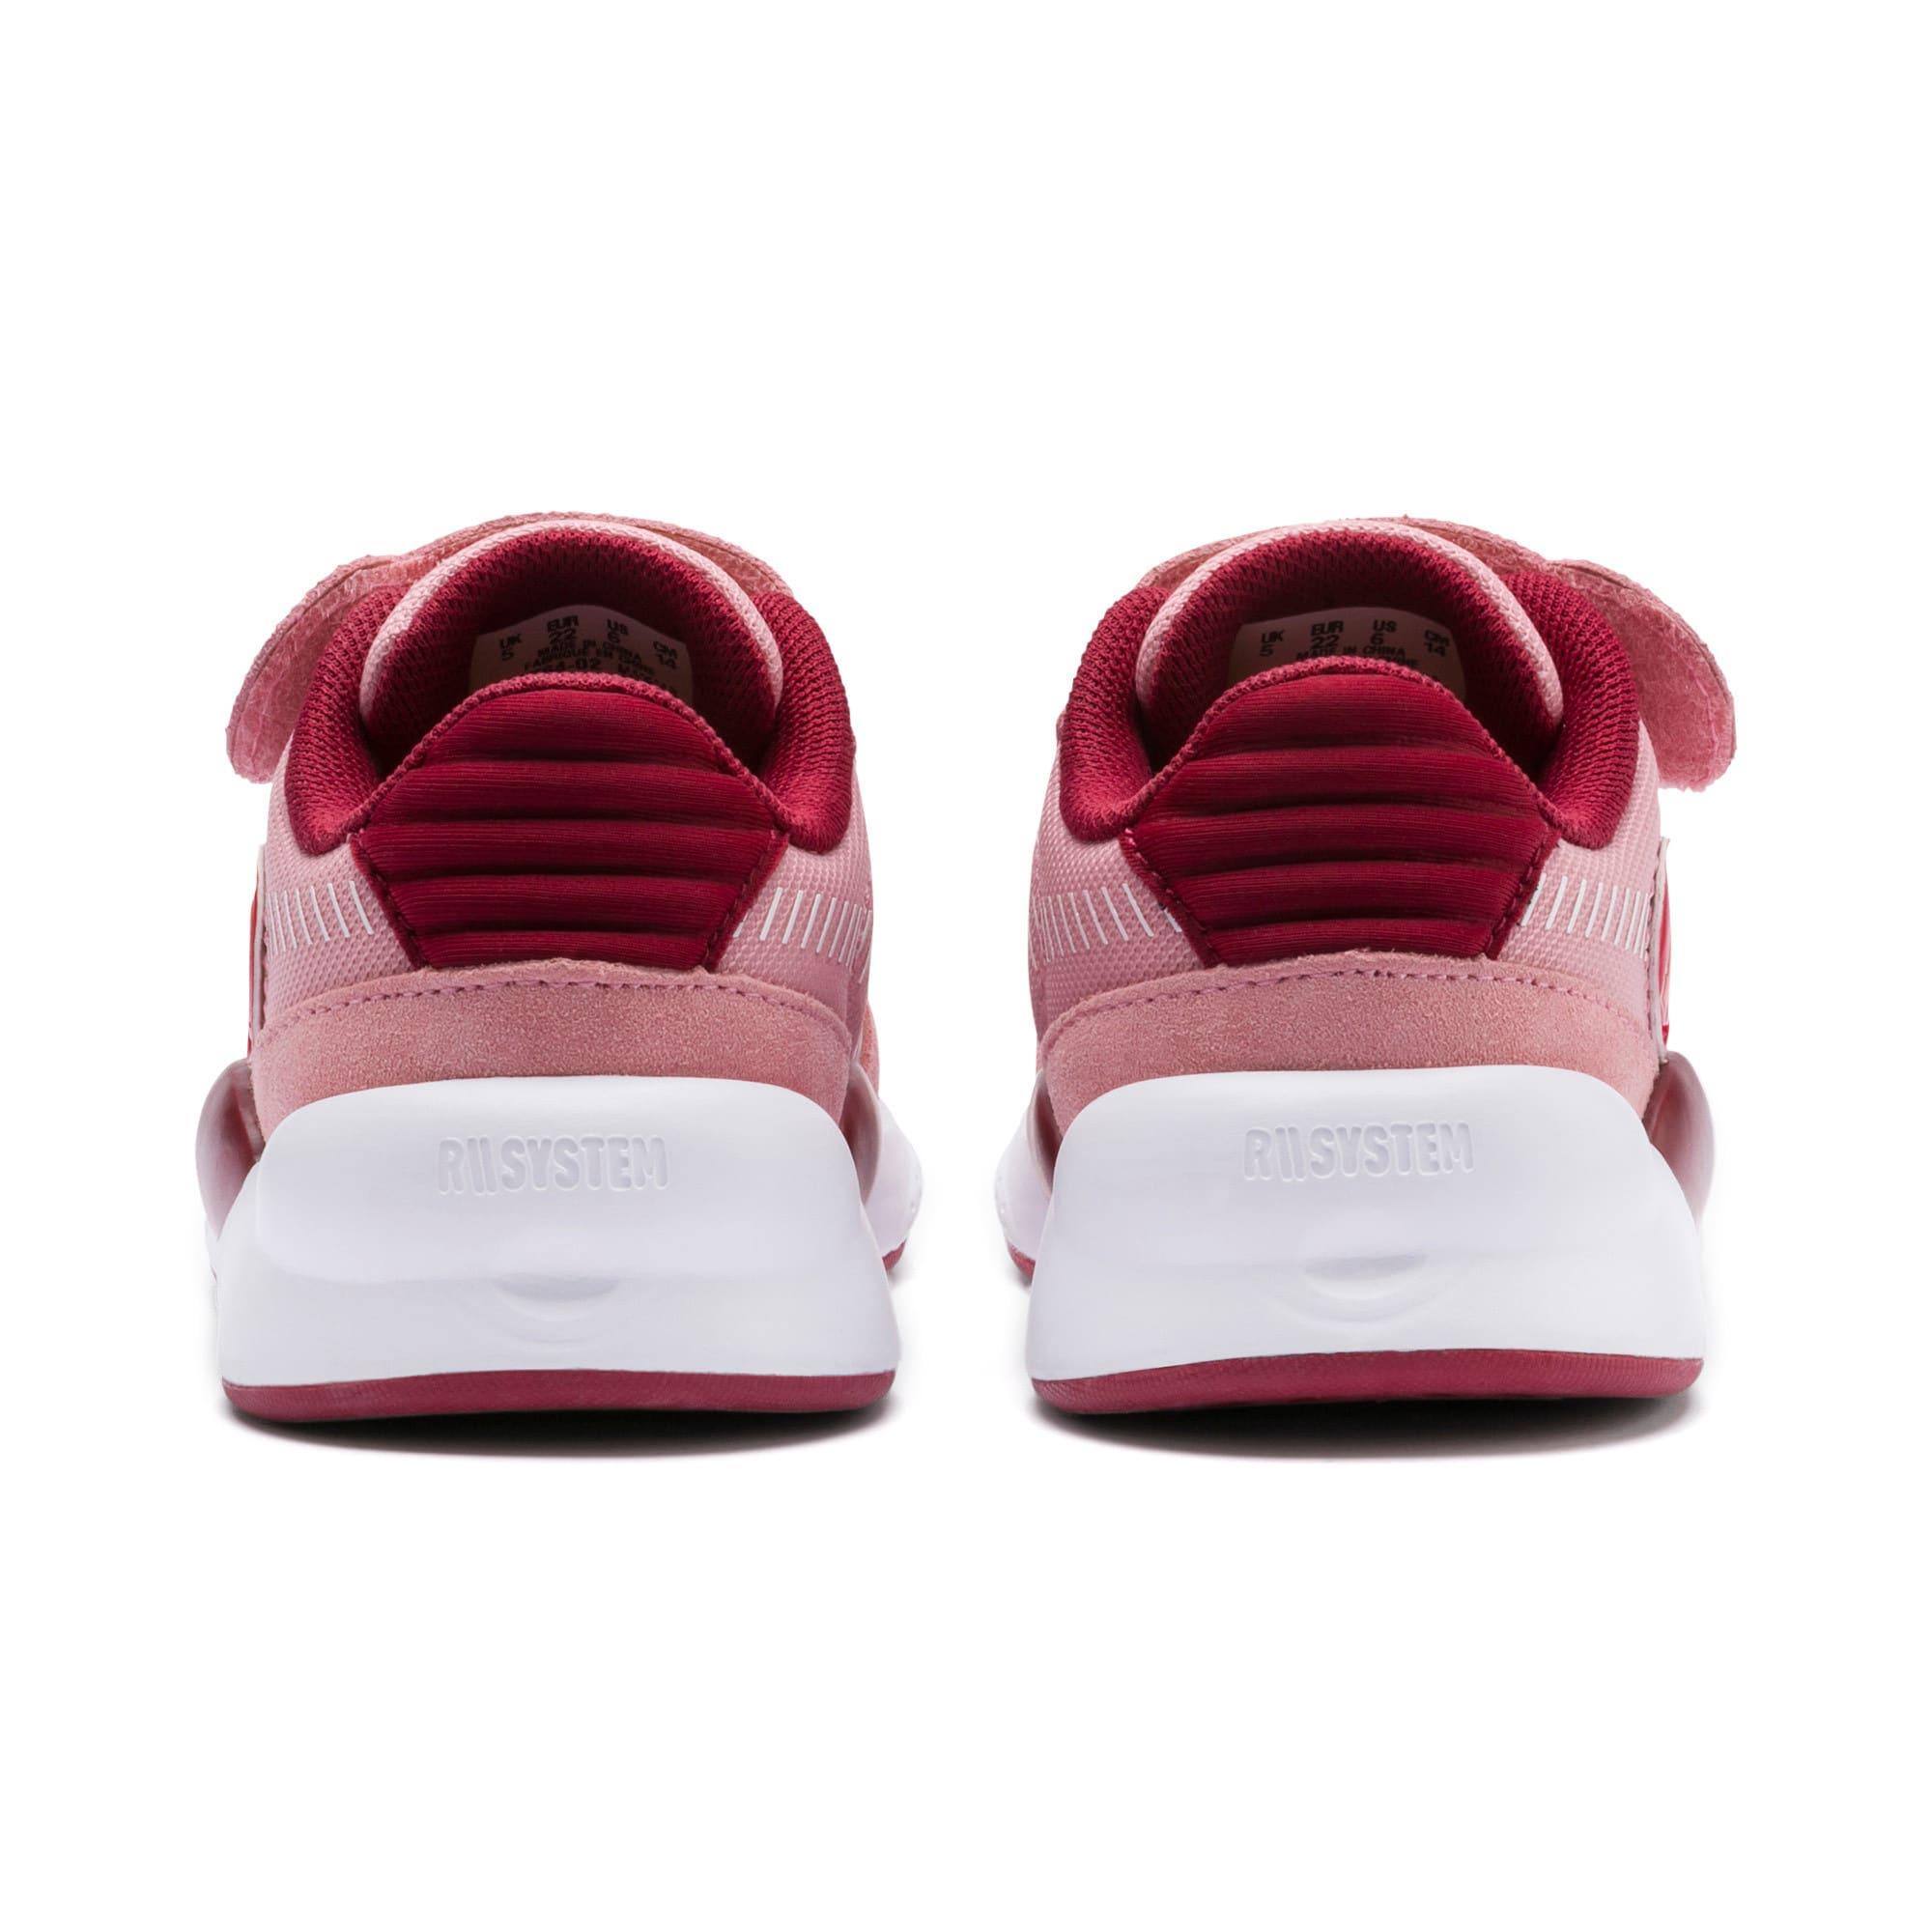 Thumbnail 3 of PUMA x SESAME STREET 50 RS 9.8 Toddler Shoes, Bridal Rose-Rhubarb, medium